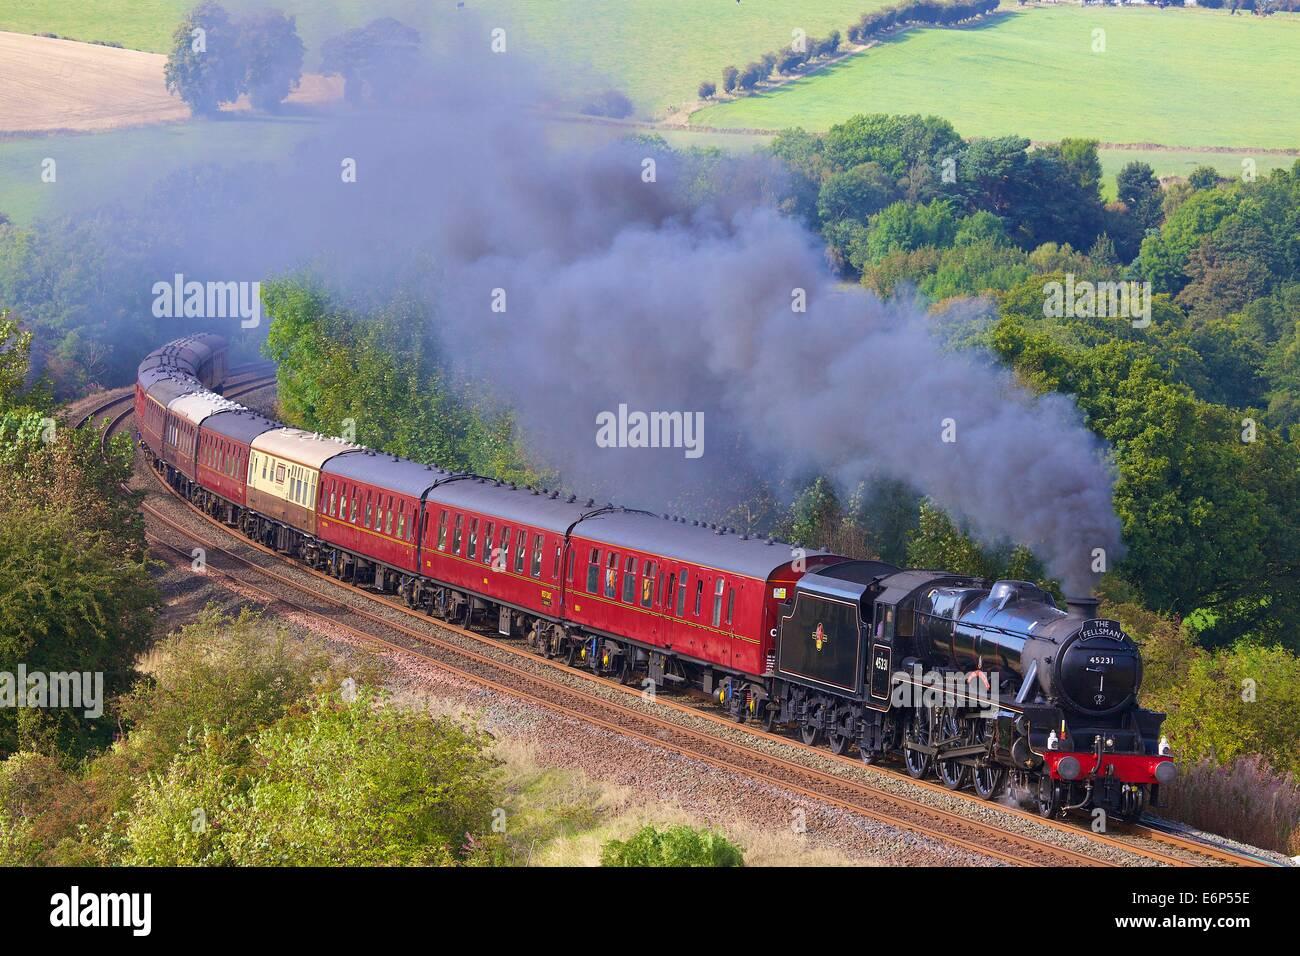 The Sherwood Forester LMS Stanier Class 5 4-6-0 45231, Steam train near Low Baron Wood Farm, Armathwaite, Settle to Carlisle Railway Line, Eden Valley, Cumbria, England, UK.